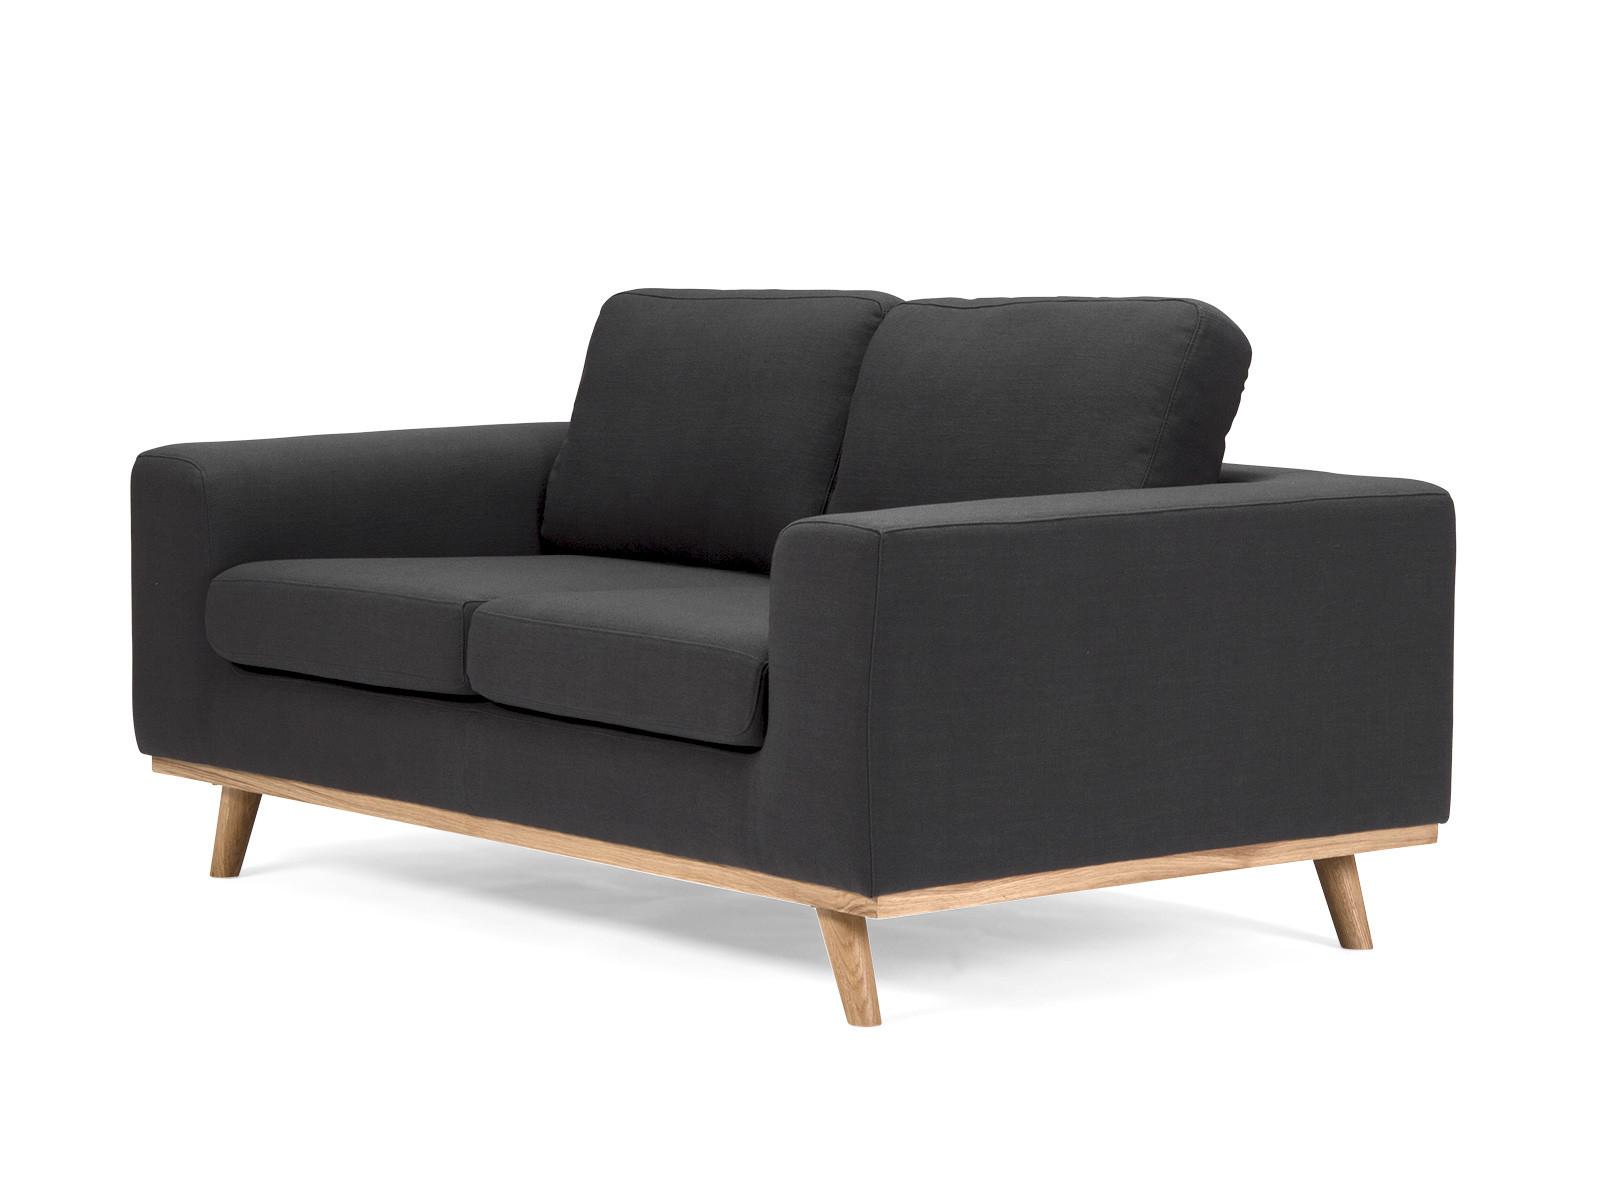 Sofa Retro Fmdf Vintage sofa Retro Couch 2 Sitzer 60er Jahre Look Aus Stoff